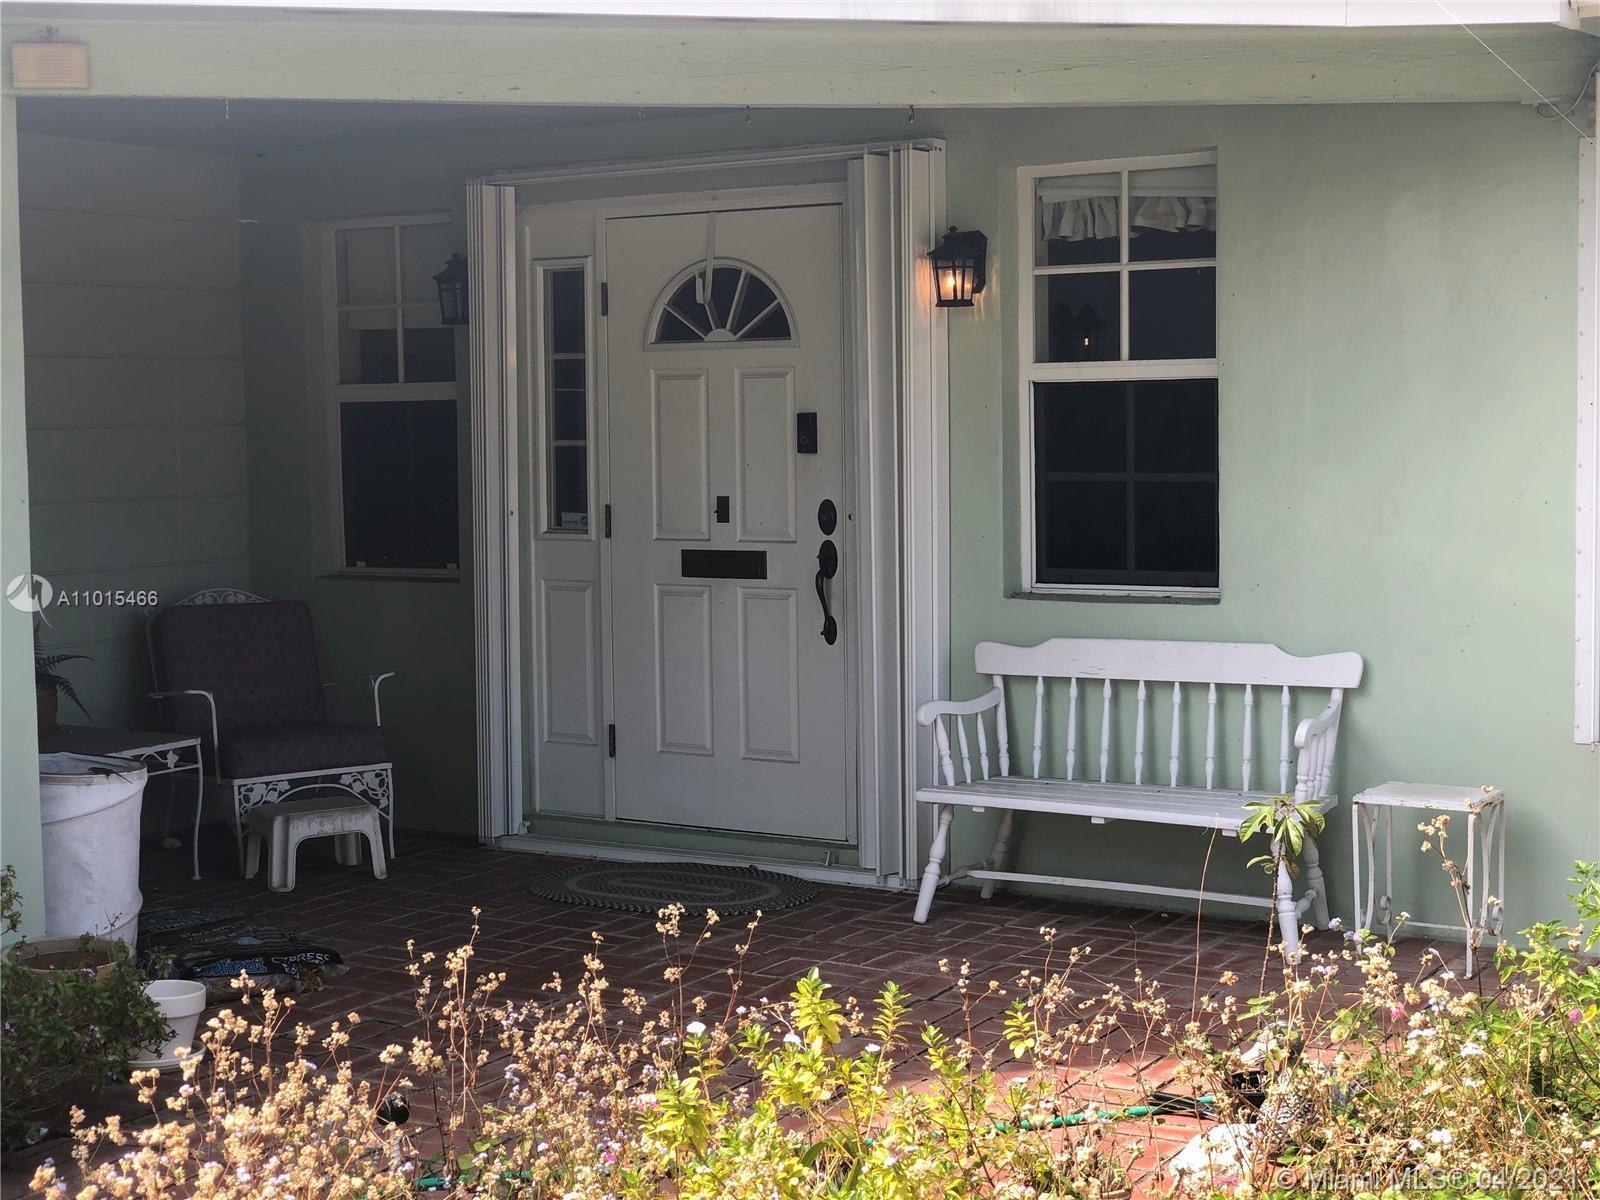 Beautiful Neighborhood! 3 Bed 2 Bath Single Family House with Attached Garage on quiet neighborhood